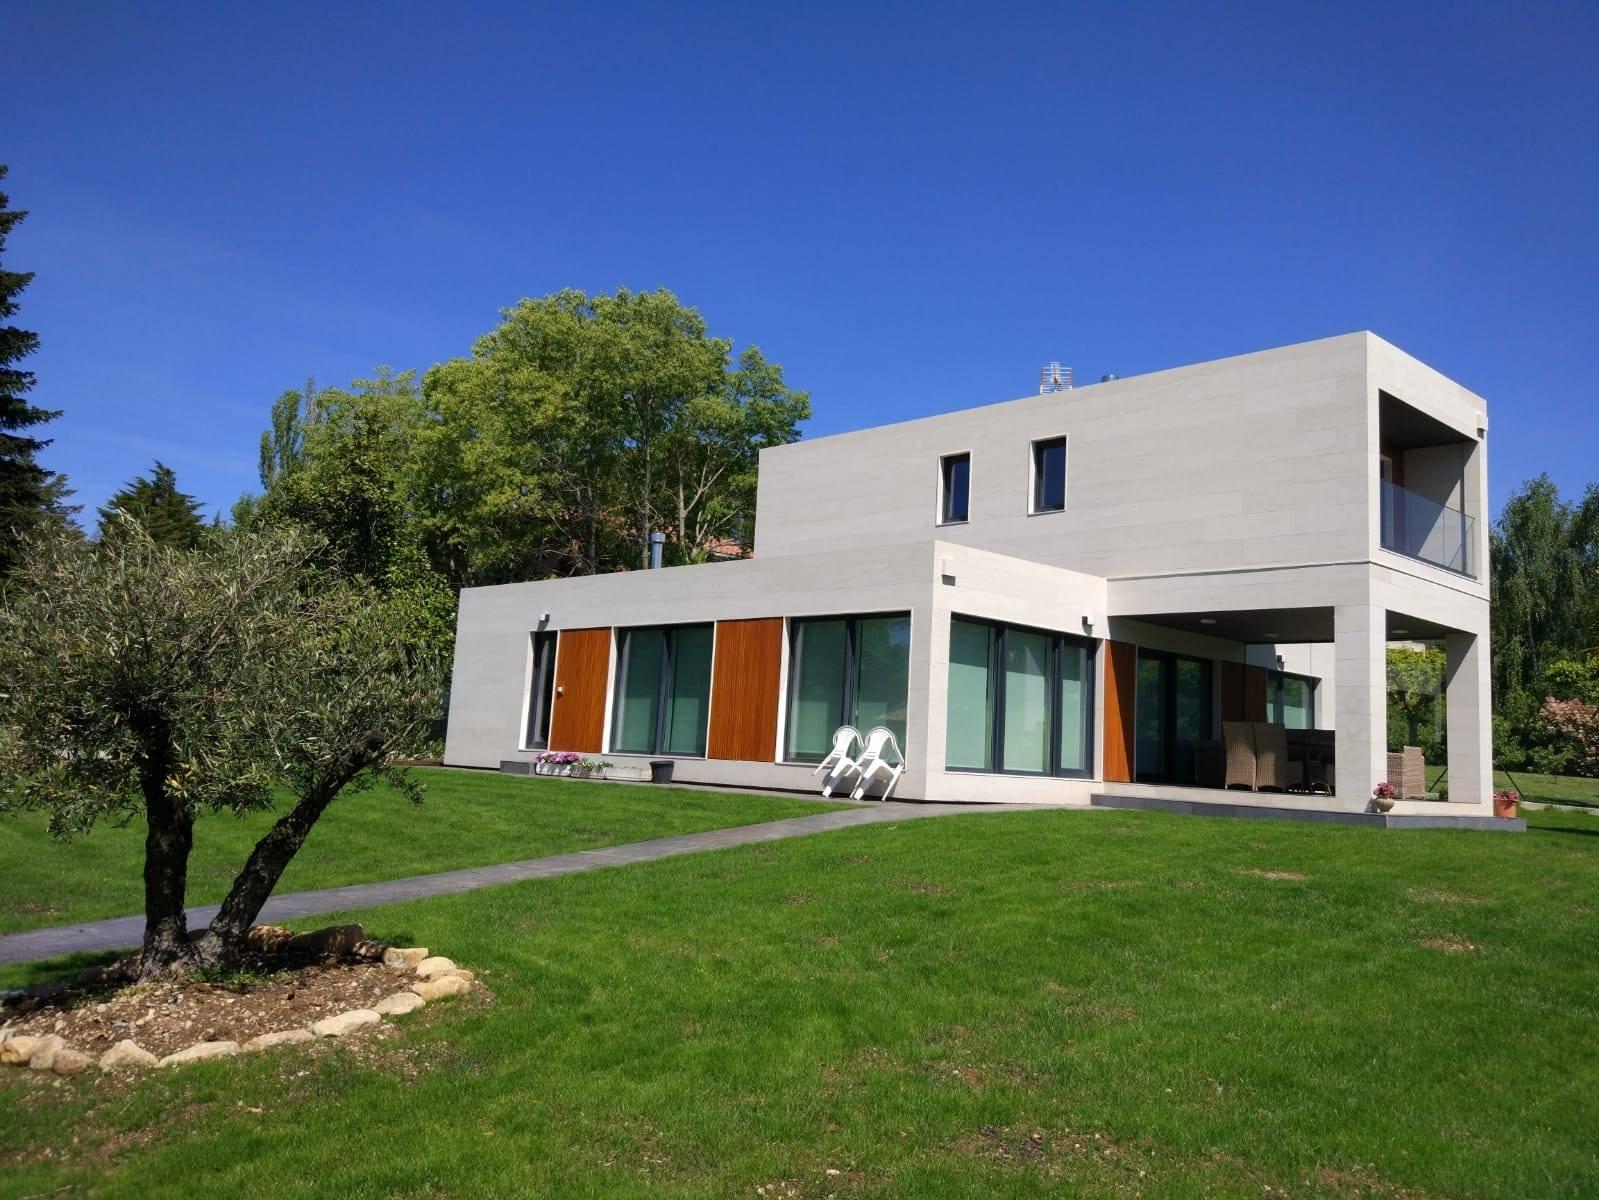 Precios de casas prefabricadas en Terrassa